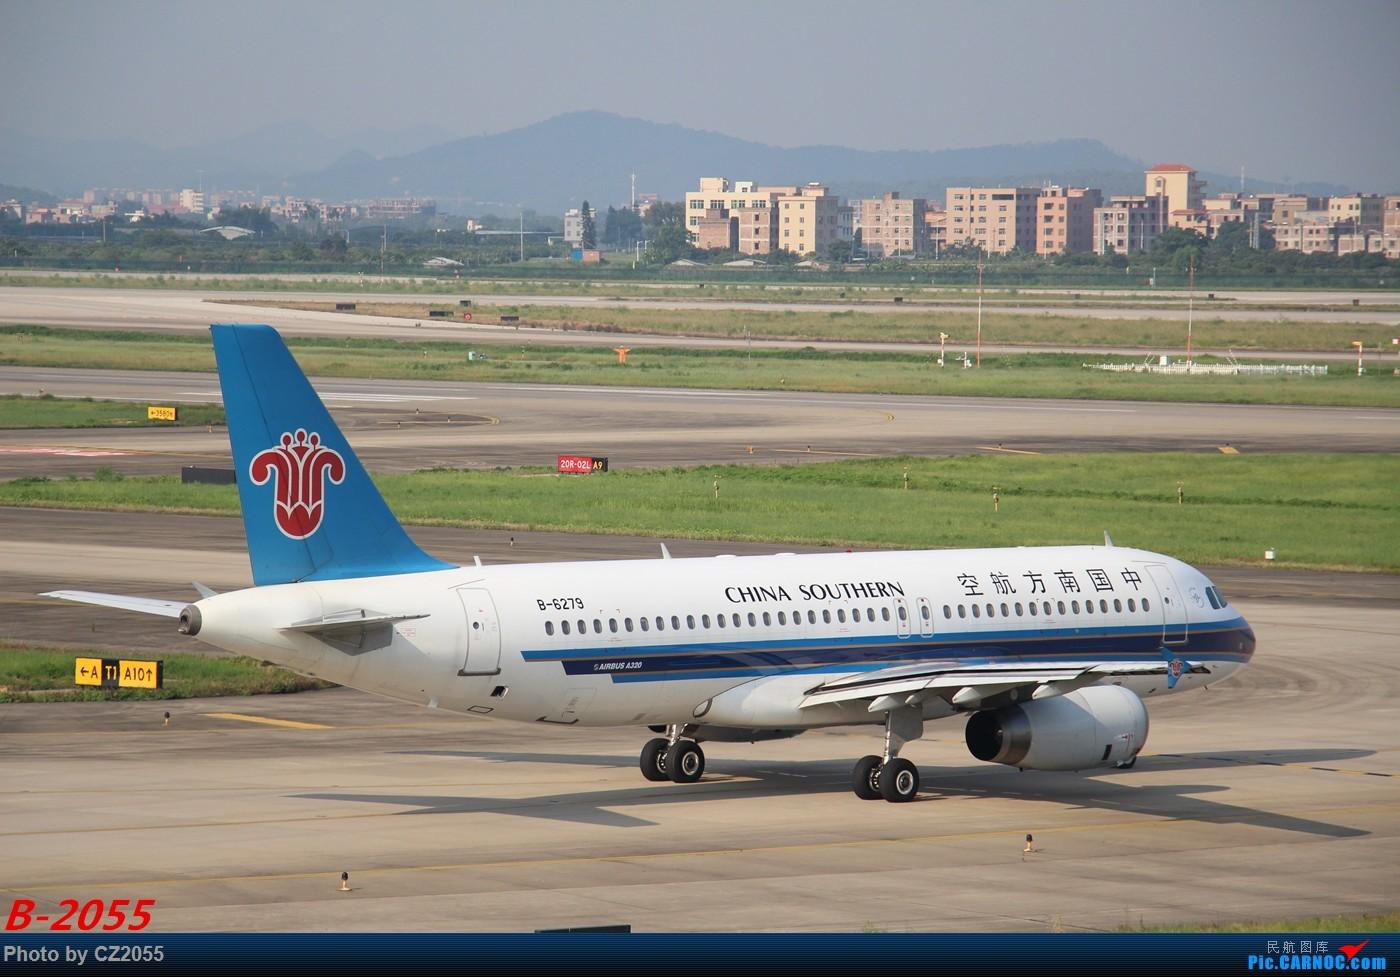 Re:[原创]Re:[原创]【广东青少年拍机小队】【C-Z-2055】发完737和宽体就升级320,那就再发一组320系列。 AIRBUS A320-200 B-6279 中国广州白云国际机场